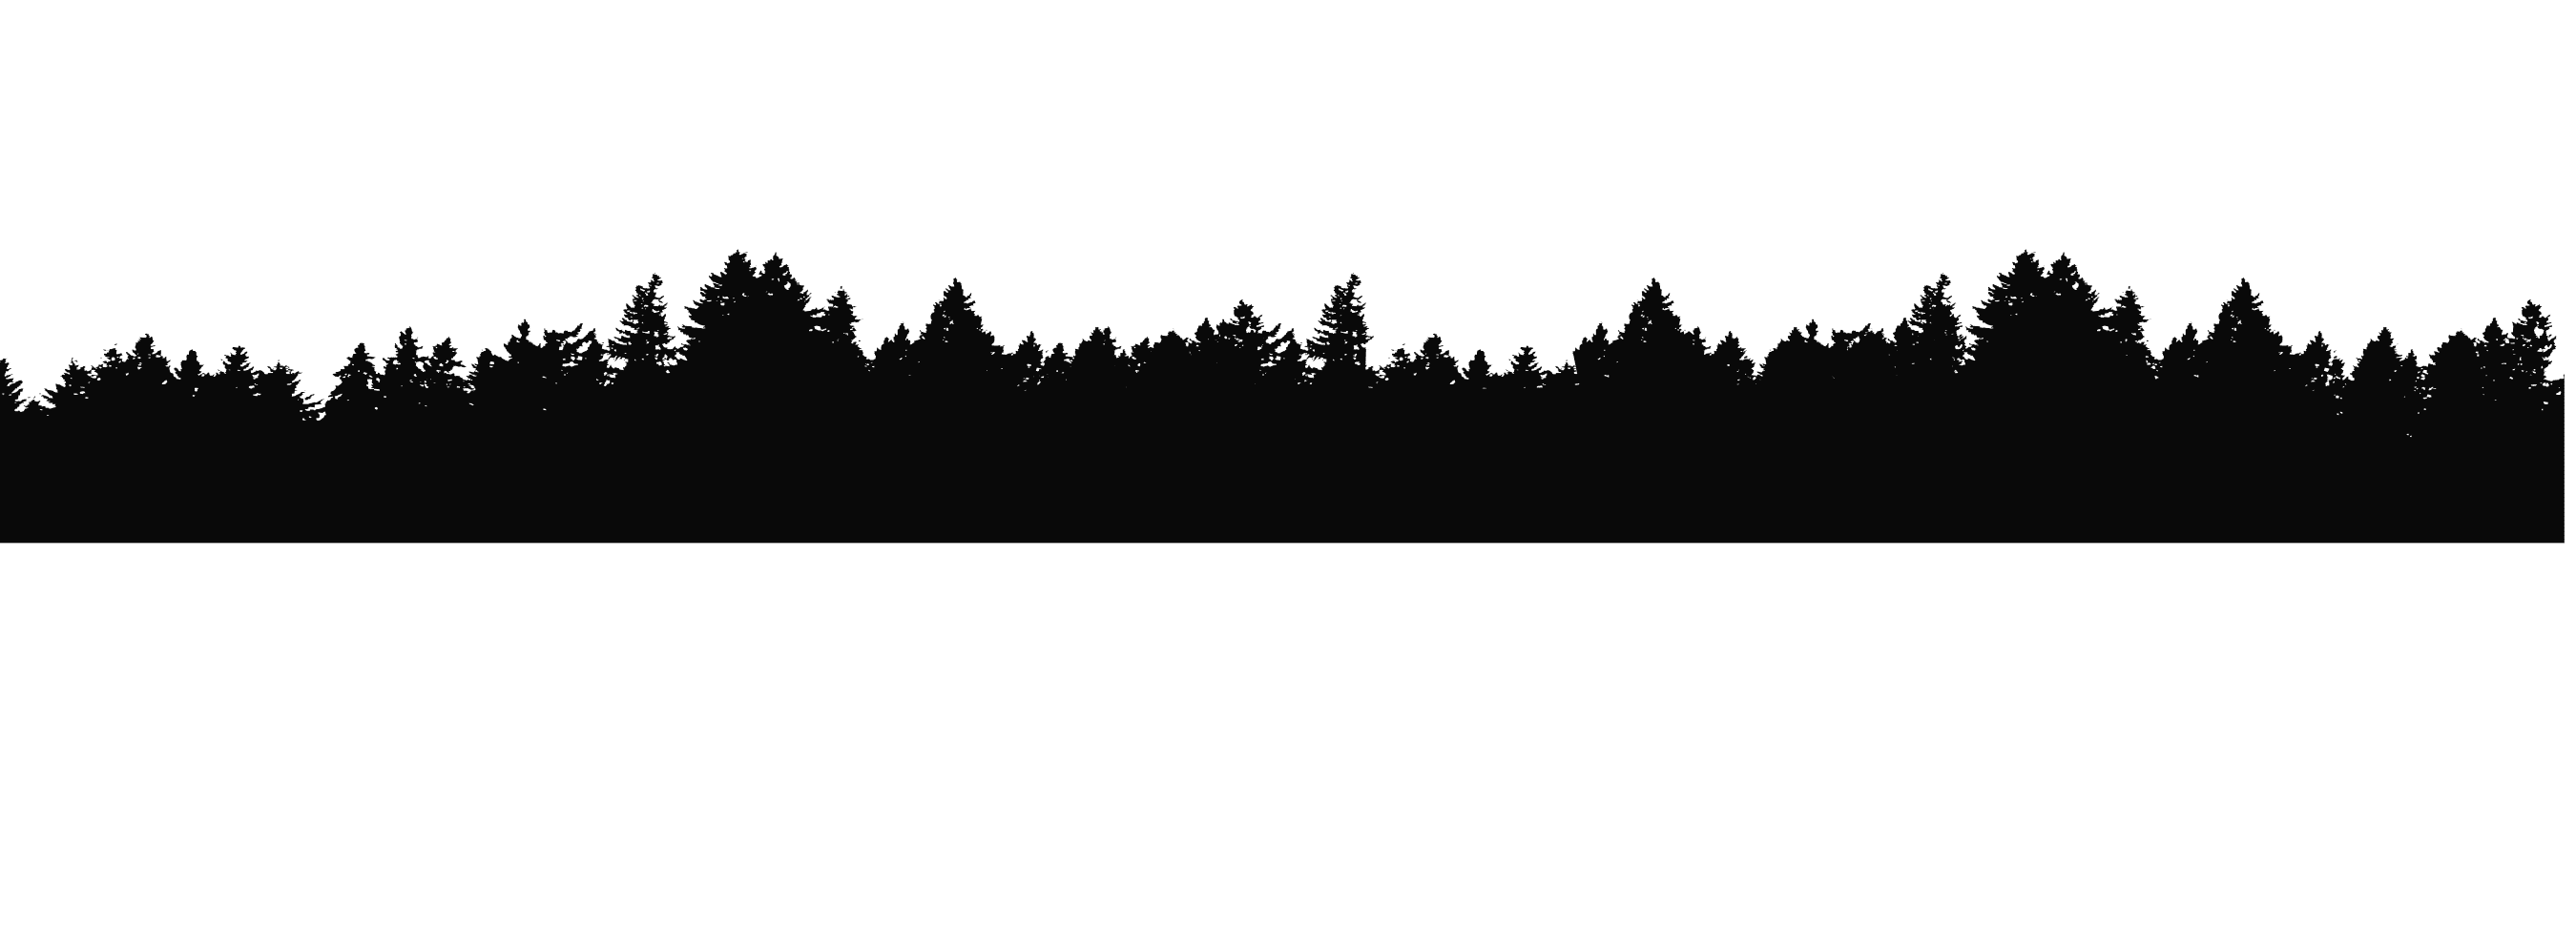 2700x993 Mountains Silhouette Clip Art Green Treeline Over (1)